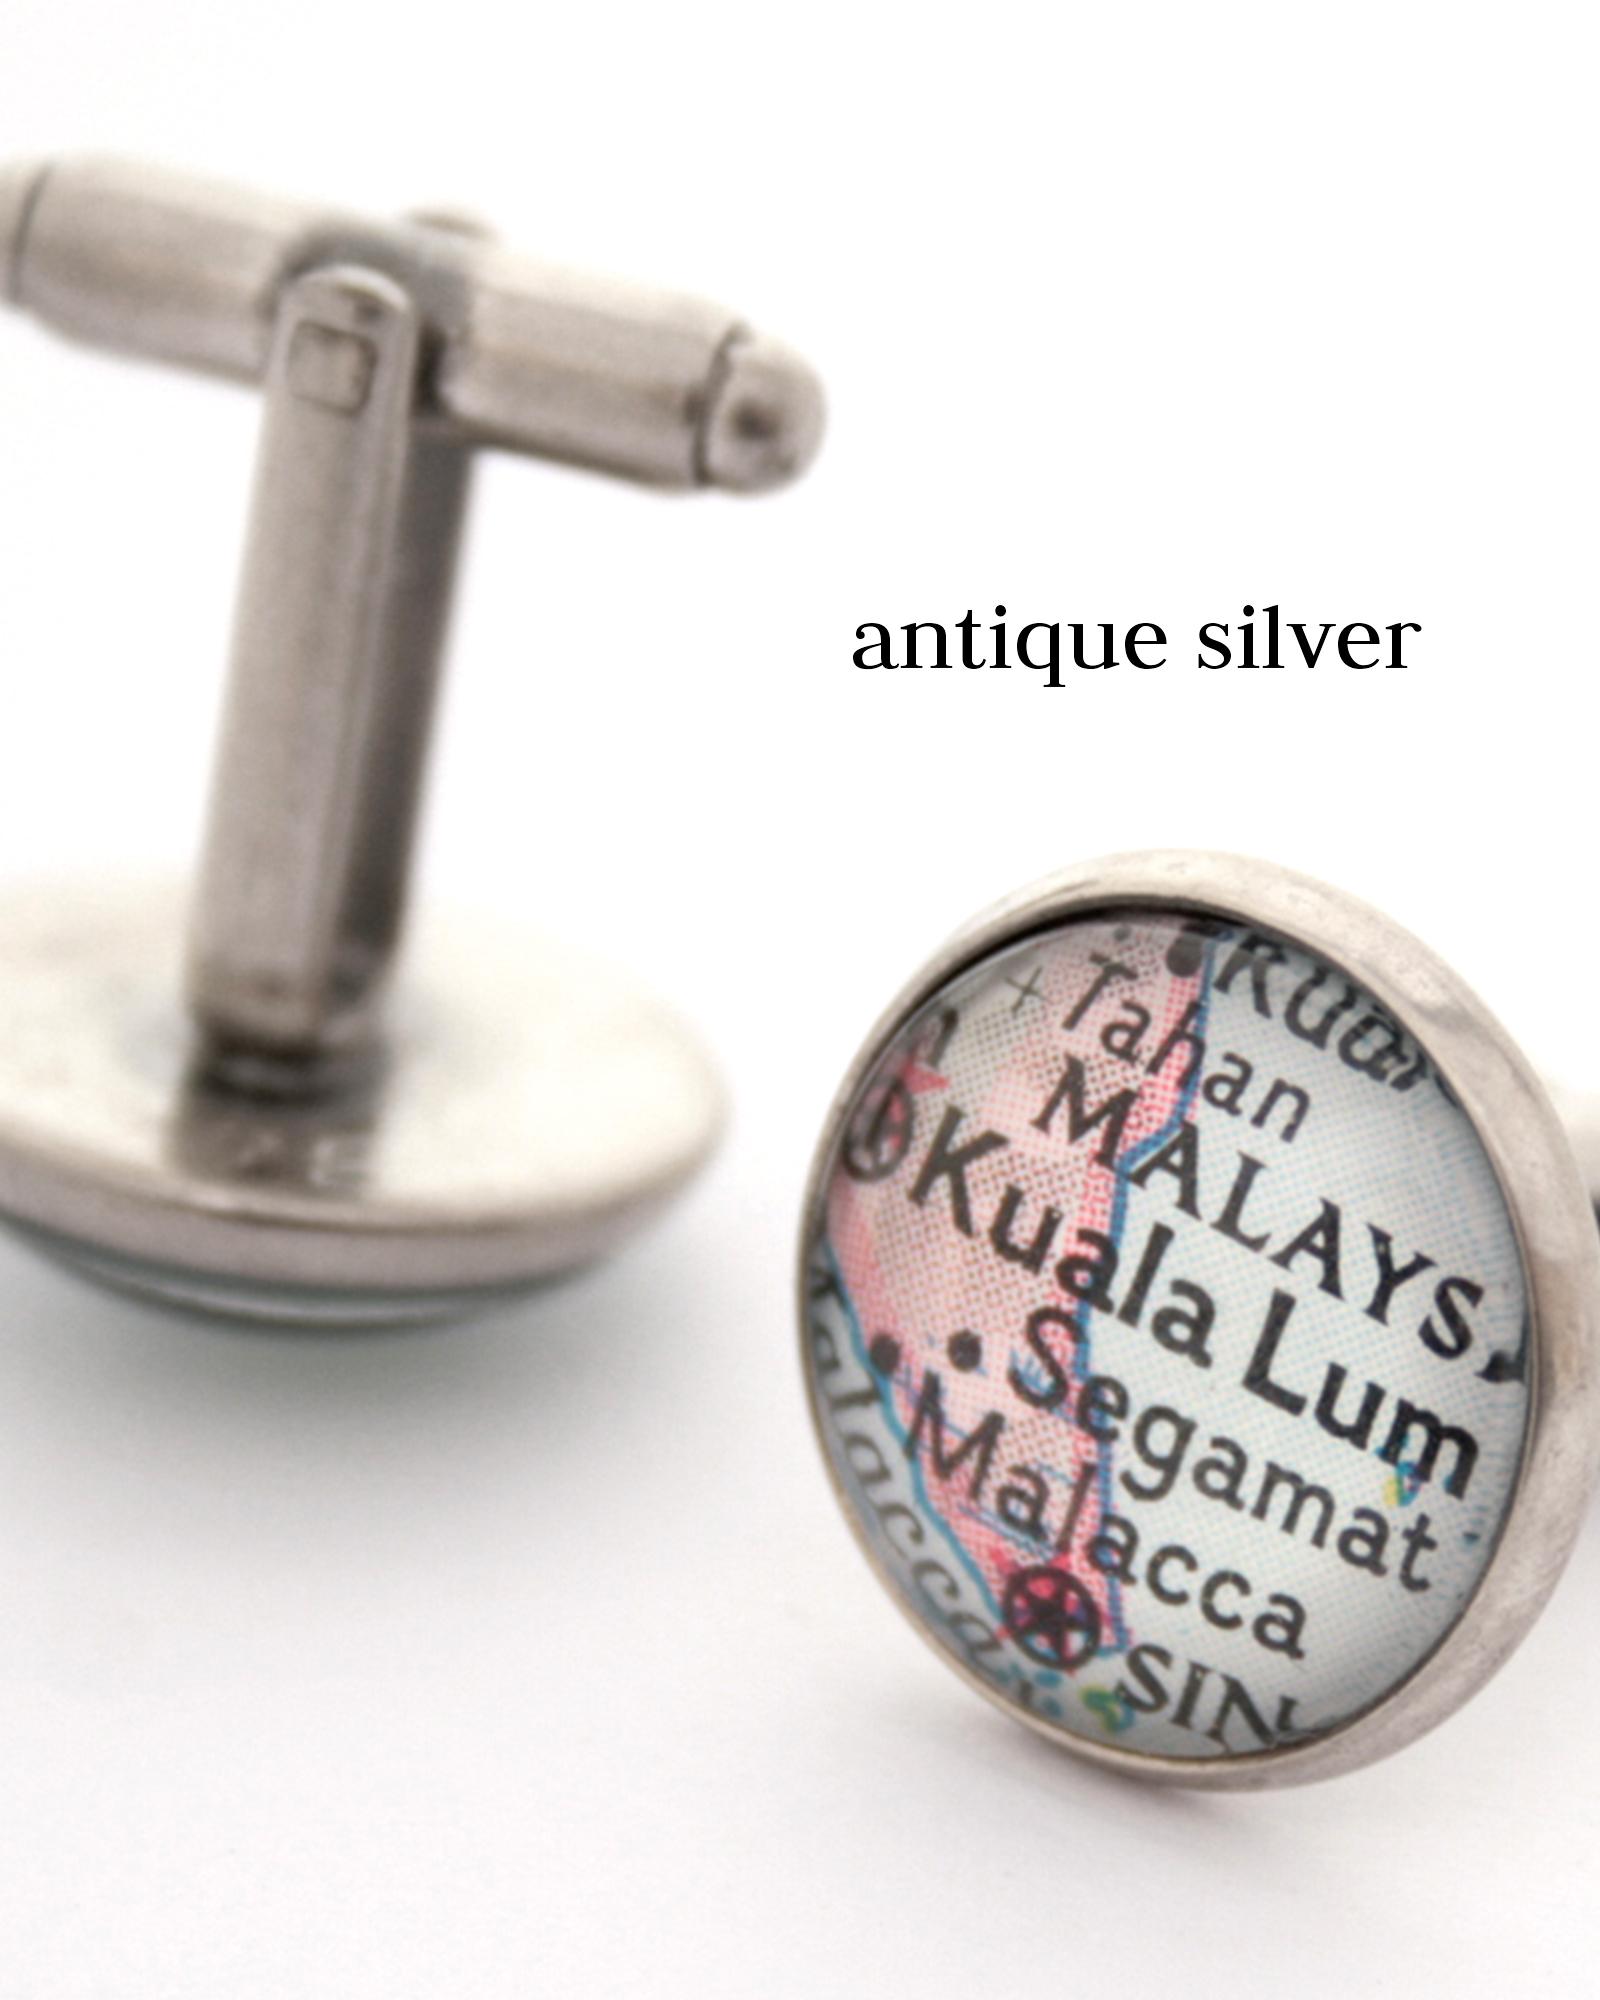 custom map cufflinks in antique silver colour